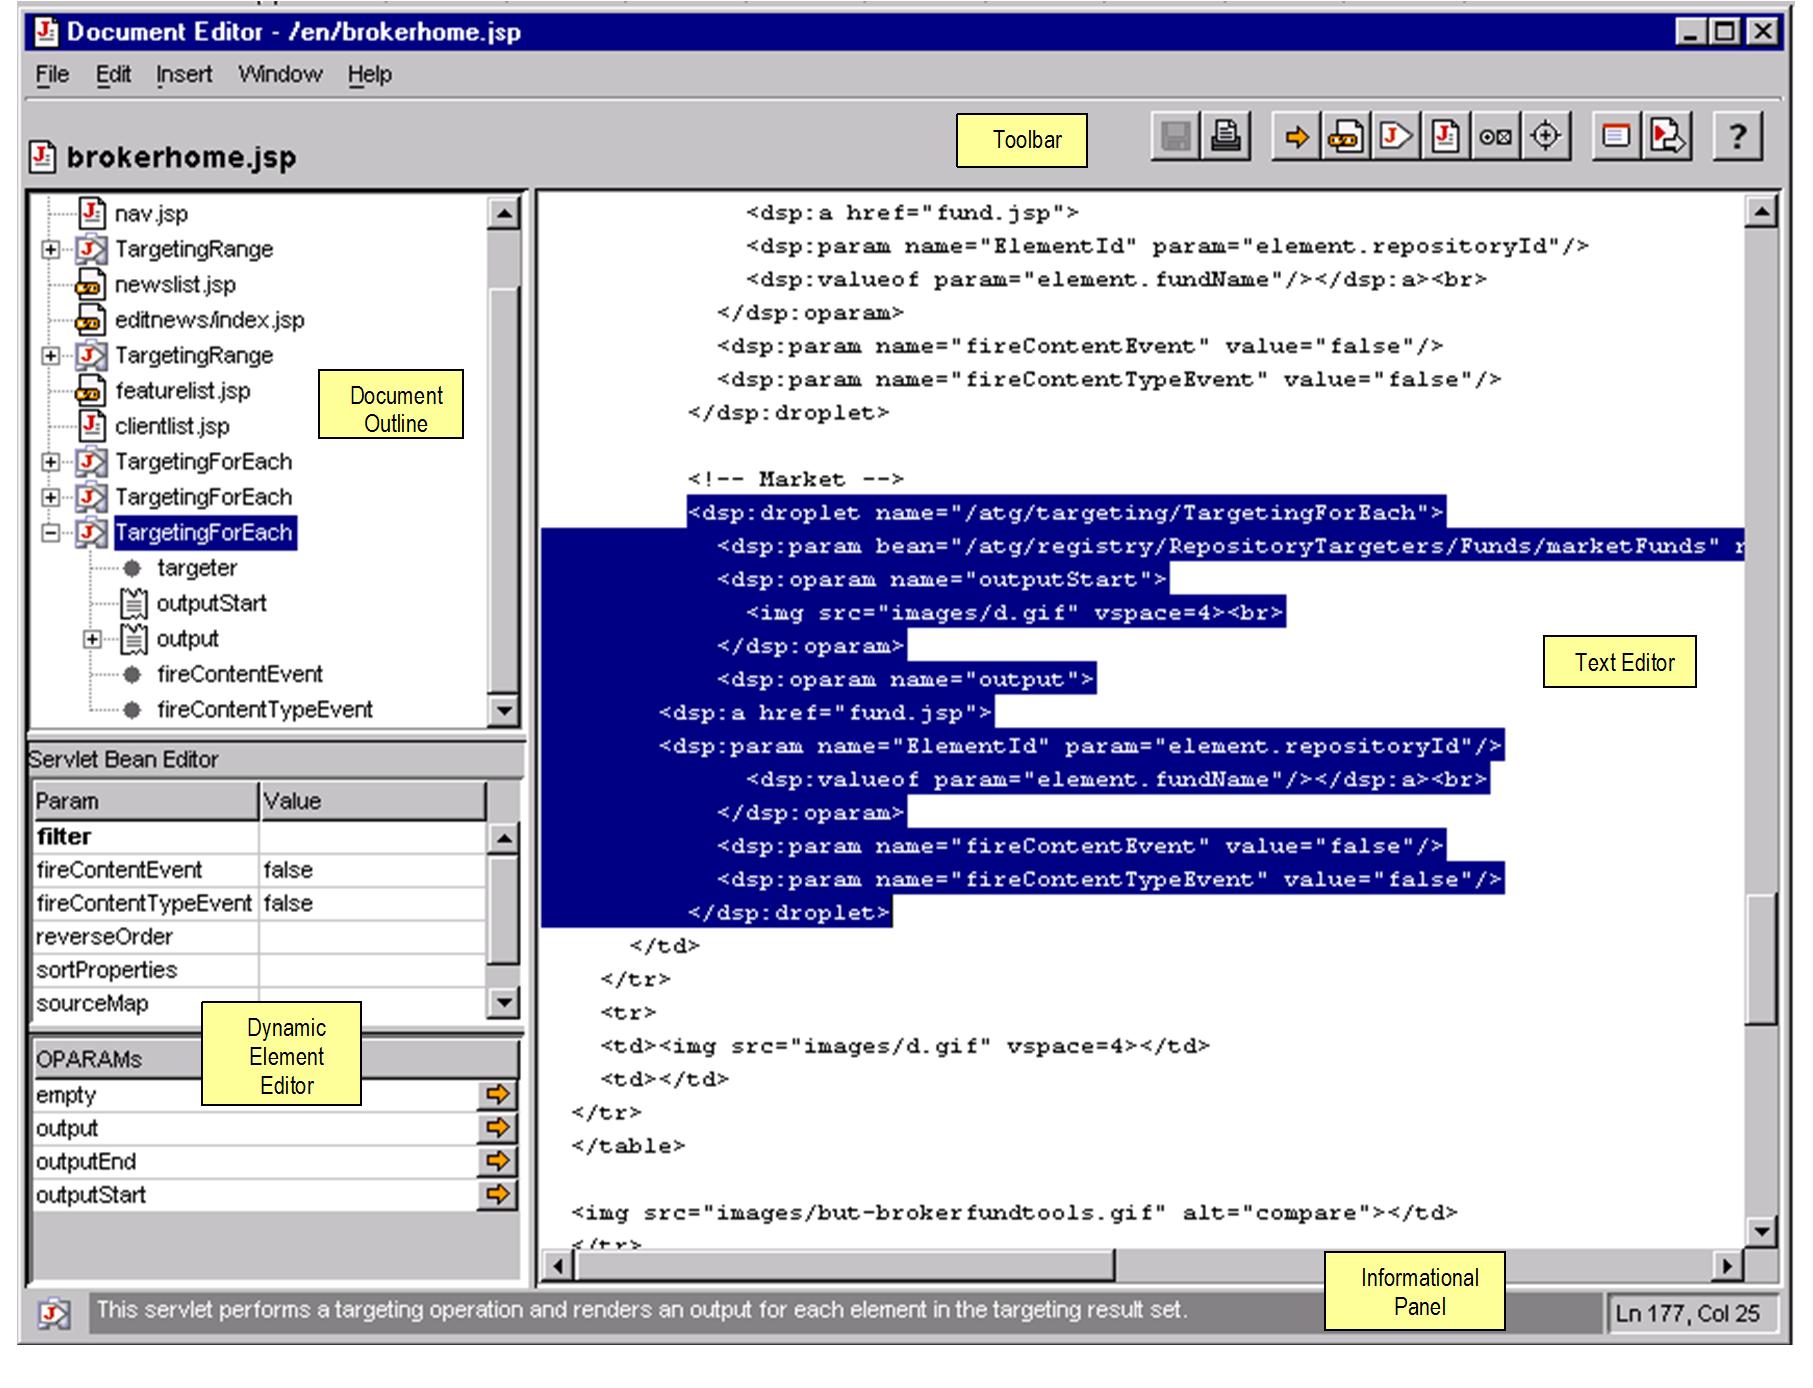 Document Editor Window